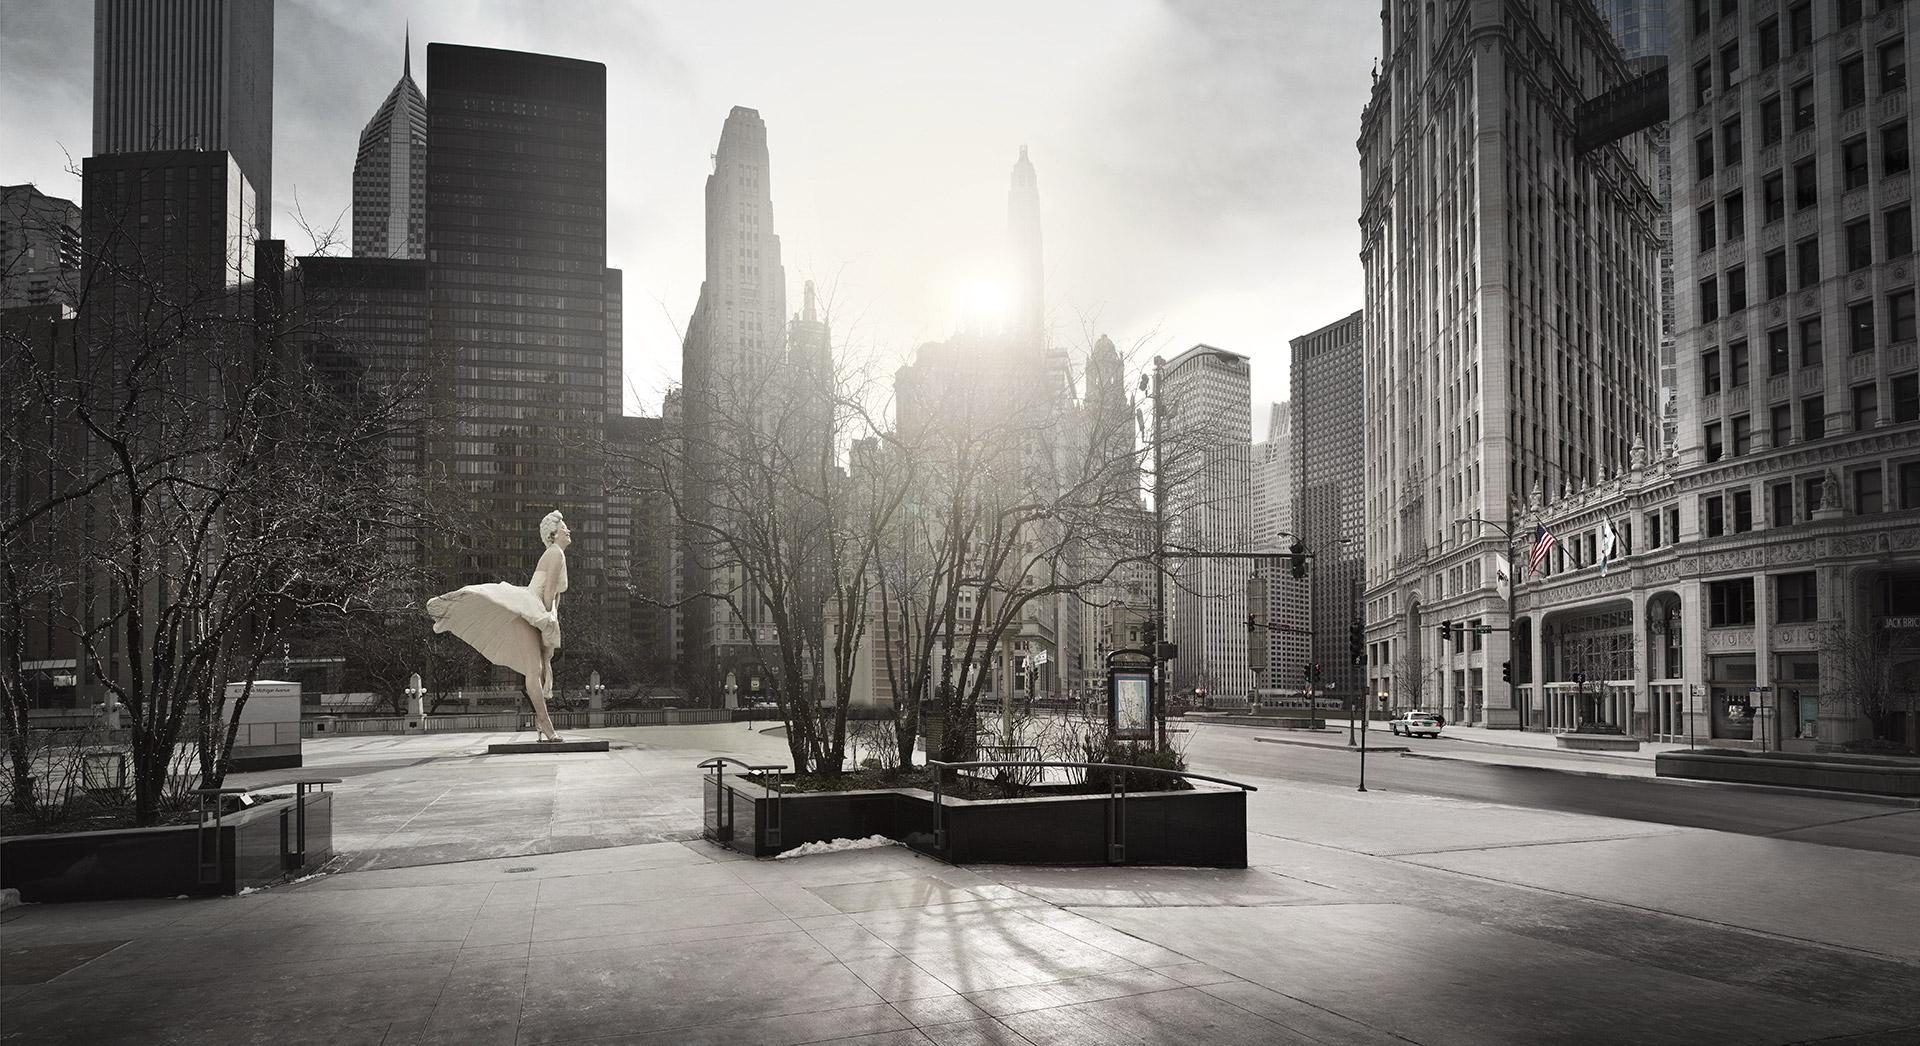 Henrik_Jauert_chicago_deserted_street